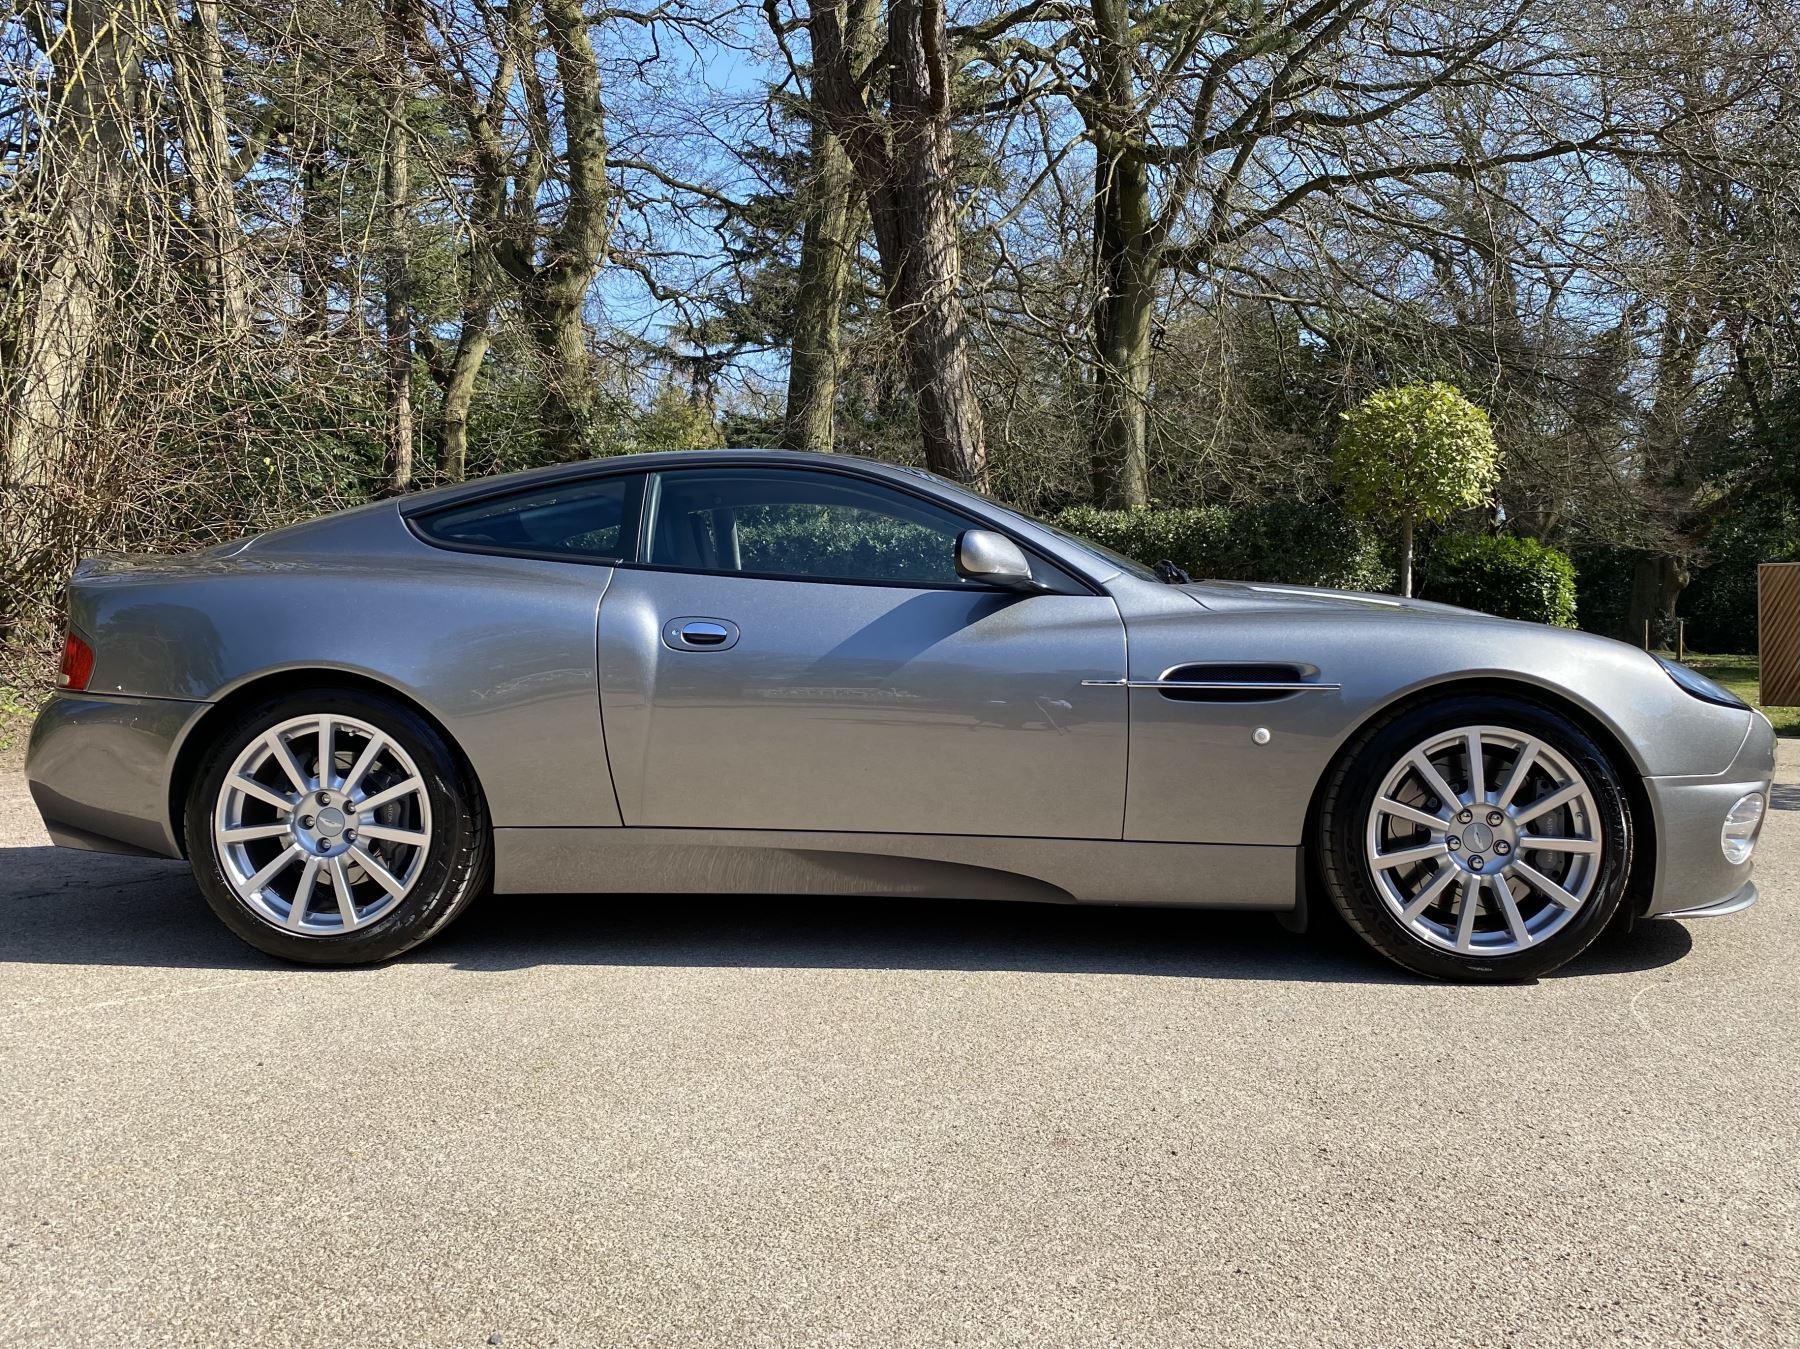 Aston Martin Vanquish S S V12 2+2 2dr image 4